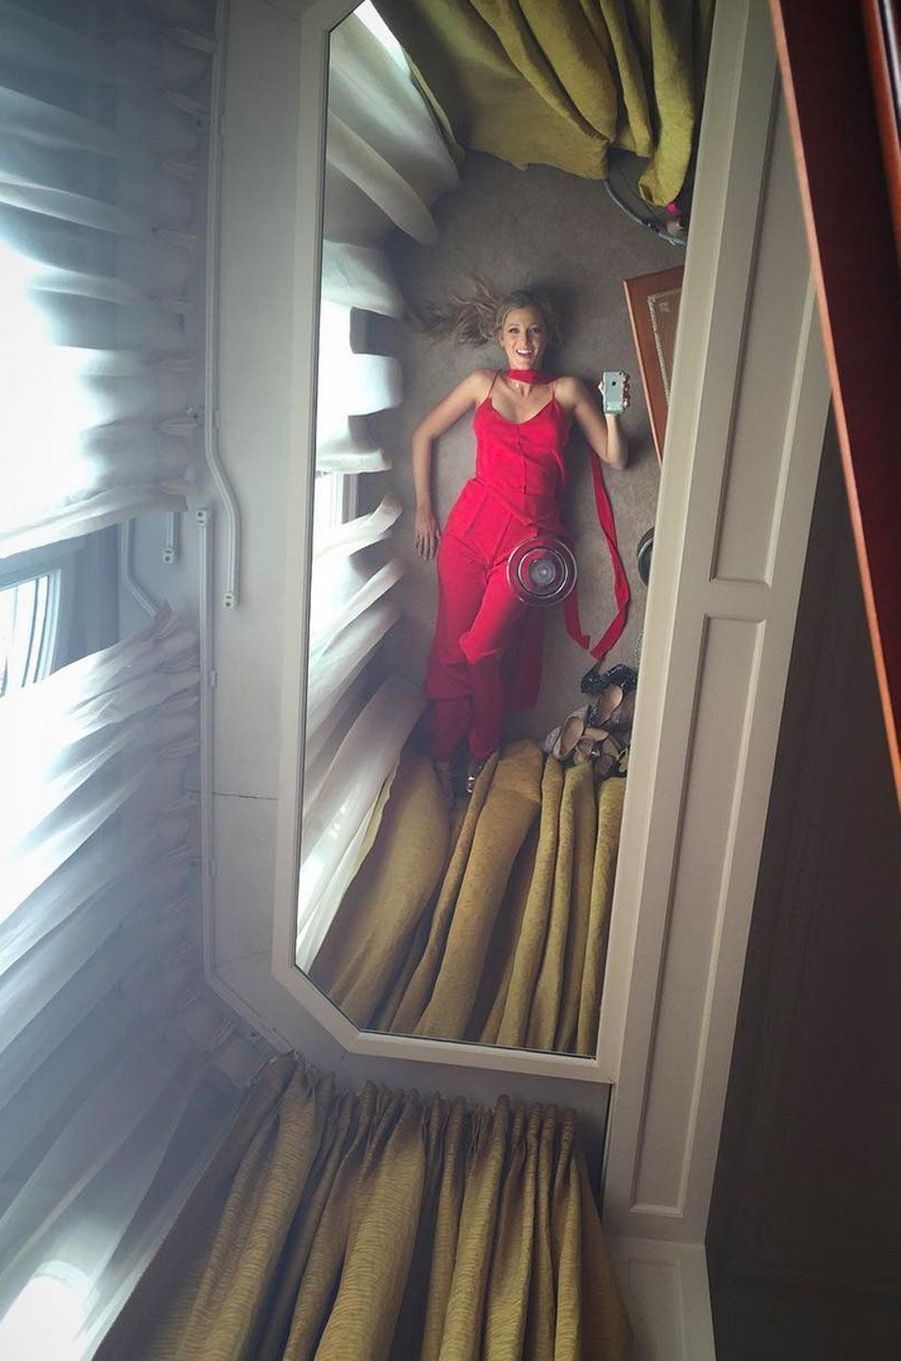 Blake Lively dans sa chambre d'hôtel avant un photocall